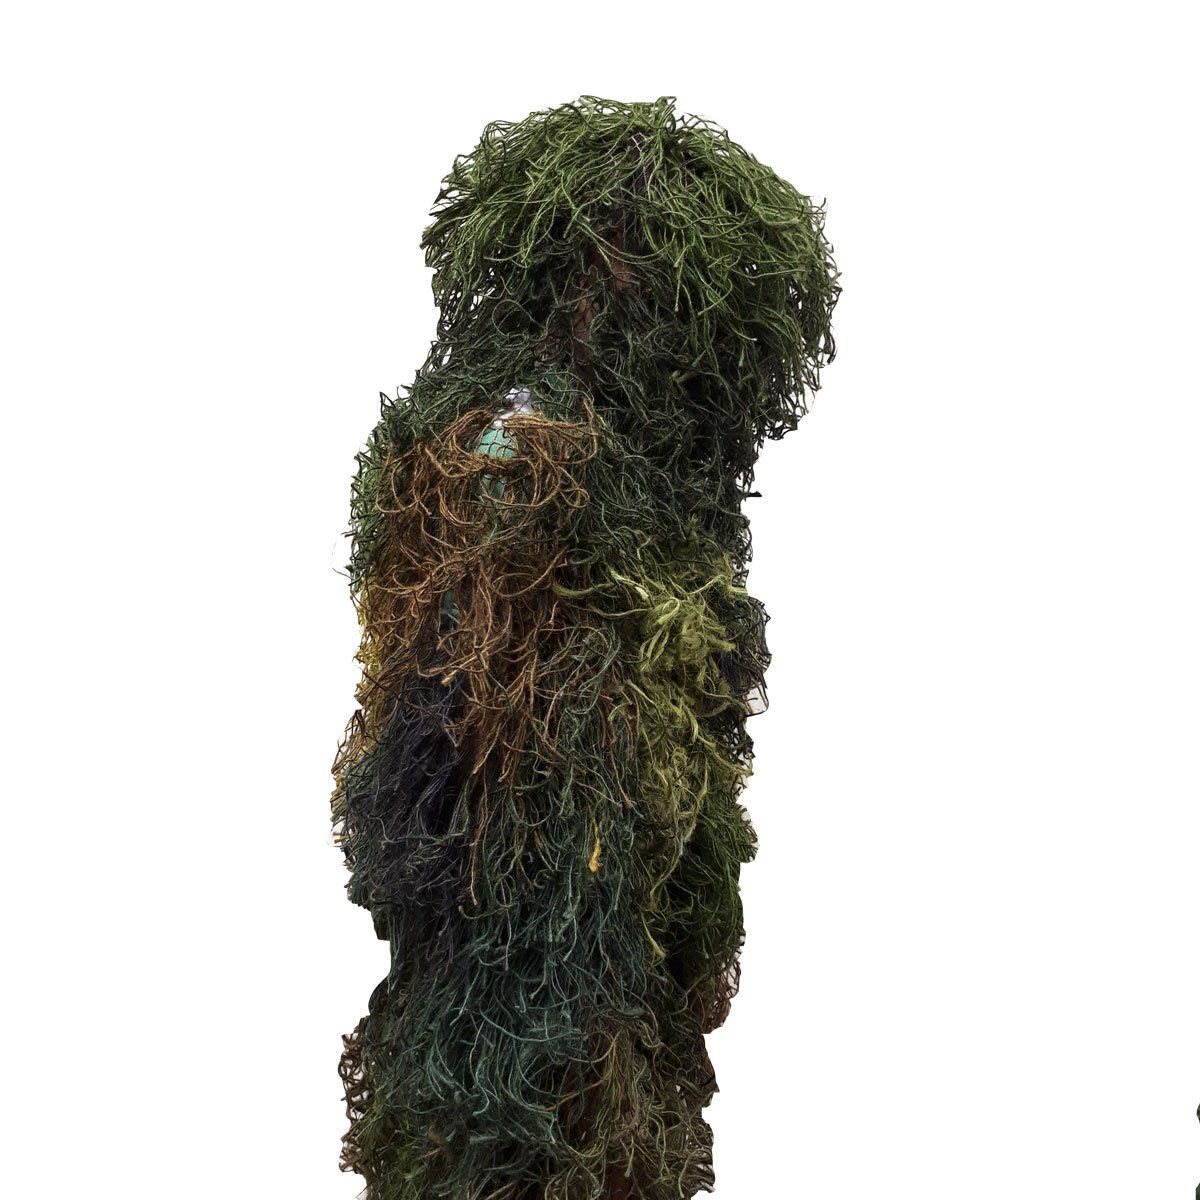 Traje Camuflagem Sniper Ghillie Suit Implastec Verde